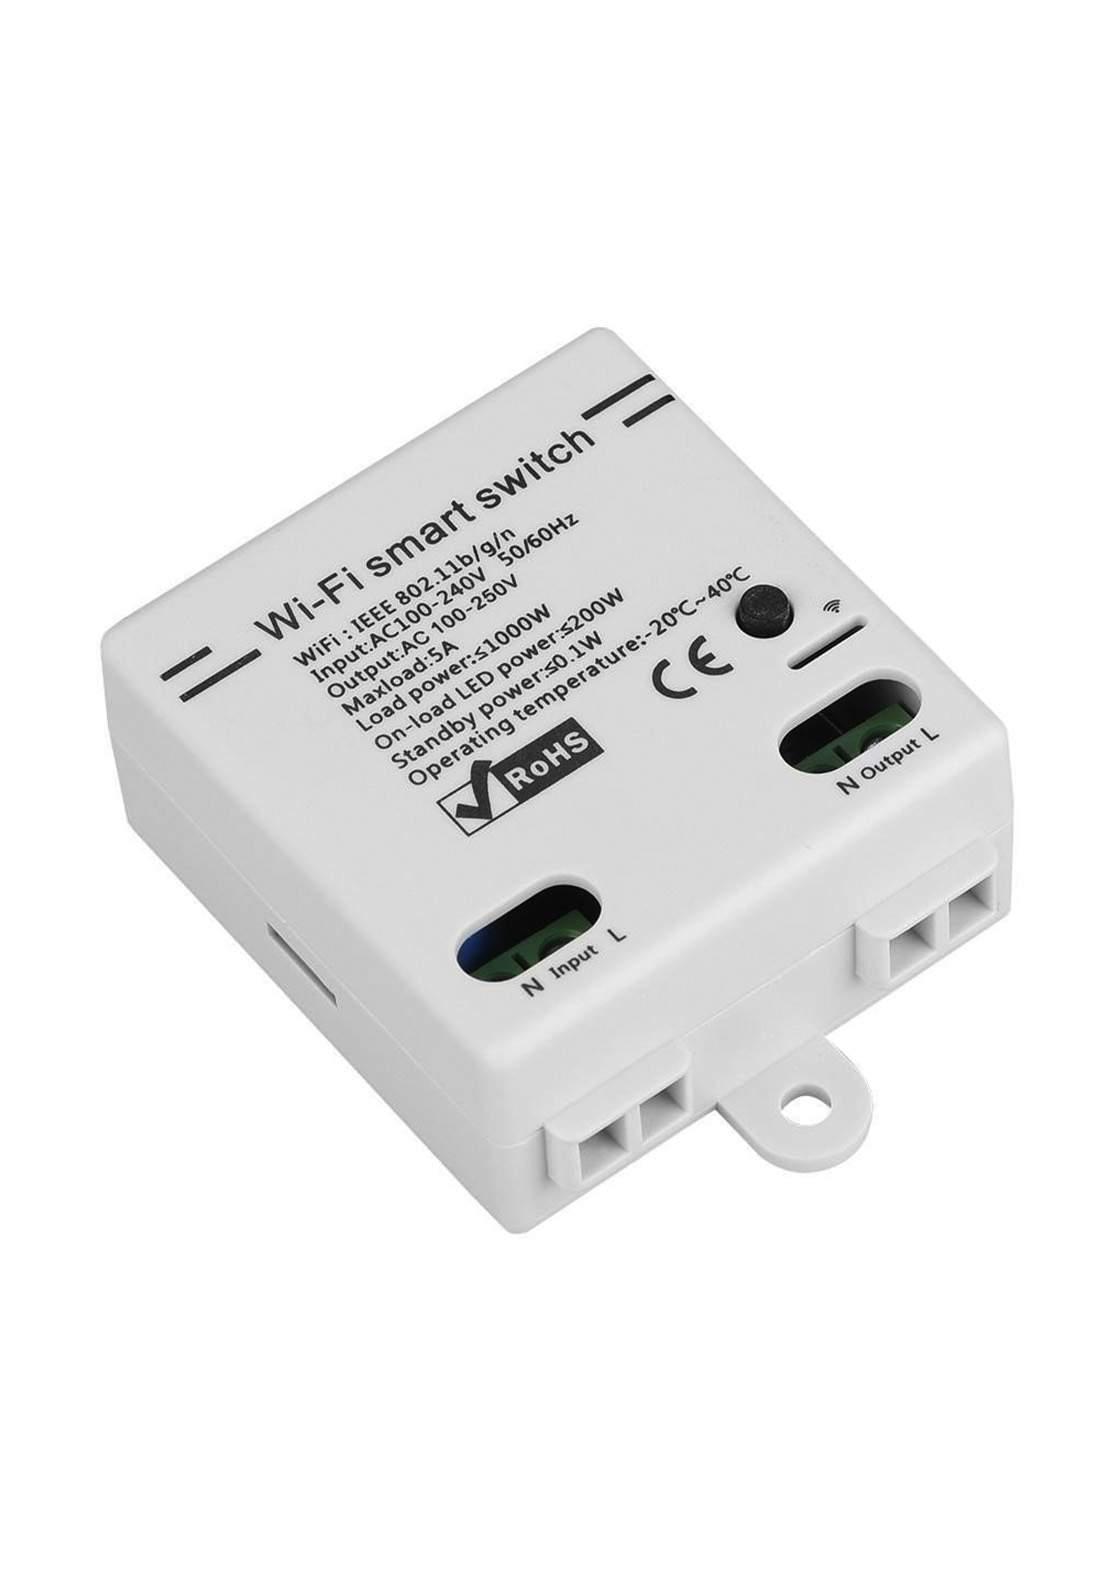 Canwing CW001 WiFi Smart Switch جوك سمارت